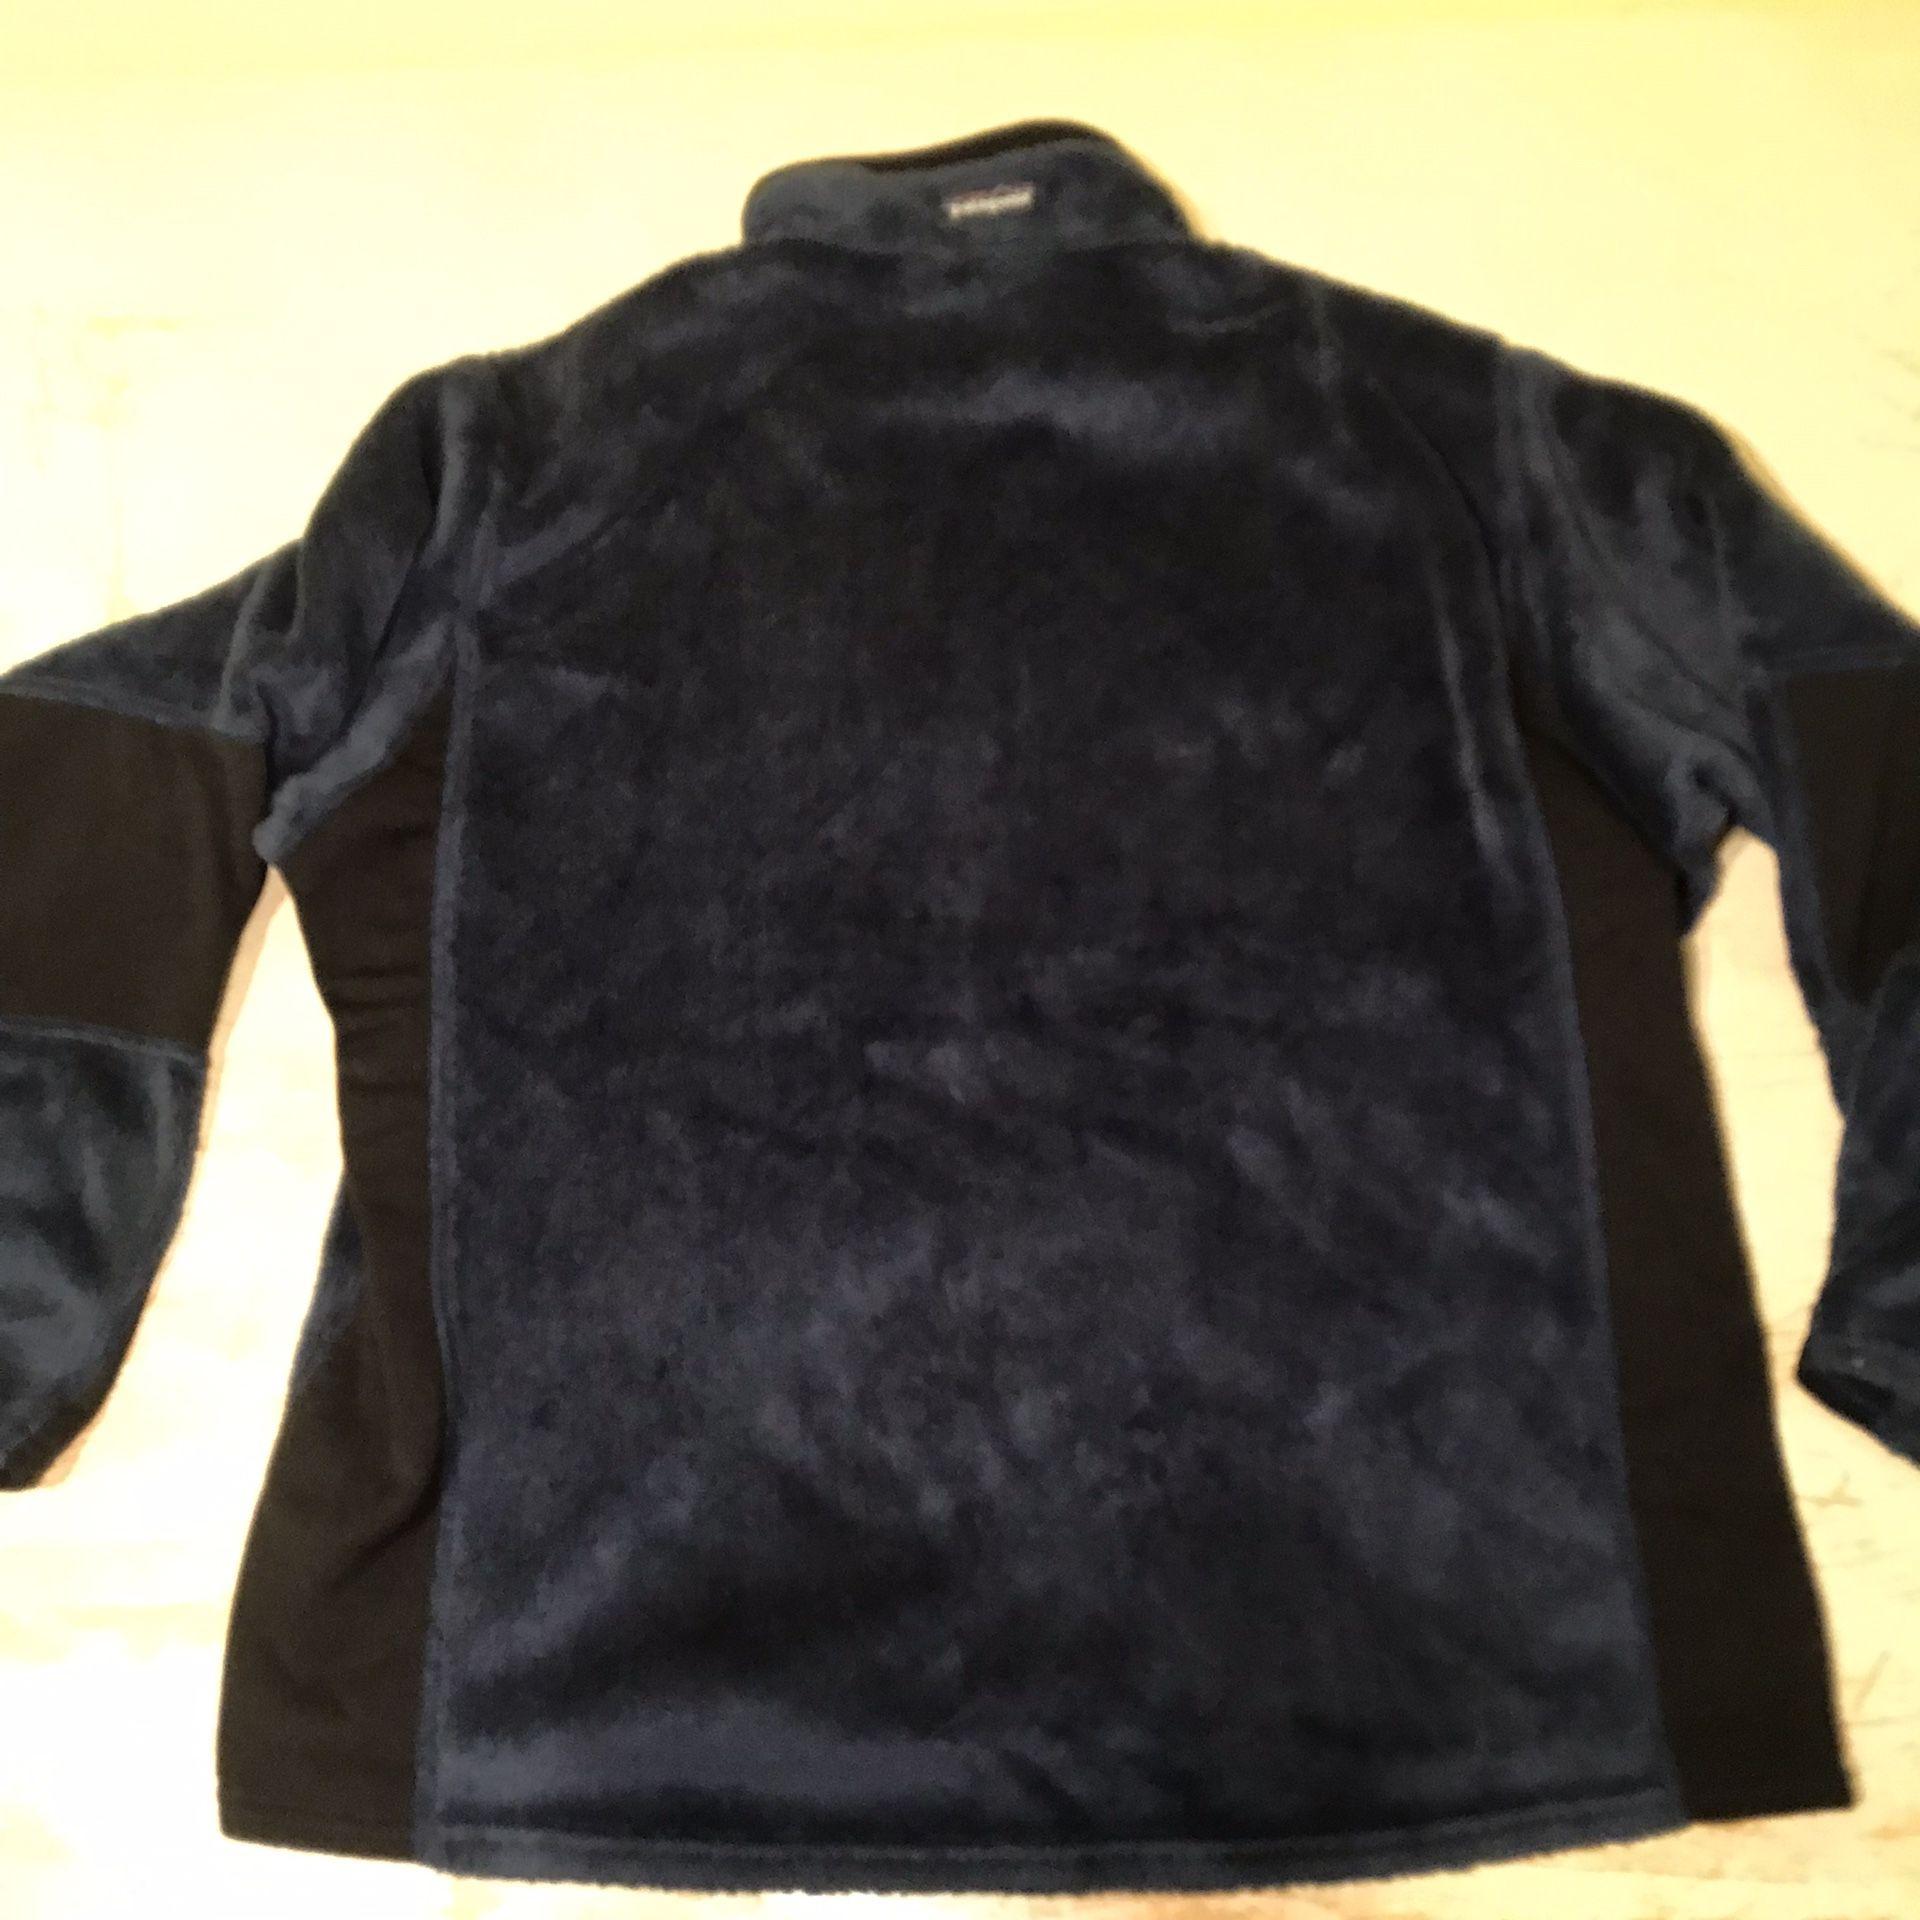 Patagonia Furry Fleece 1/4 Zipped Blue Jacket Sz Large